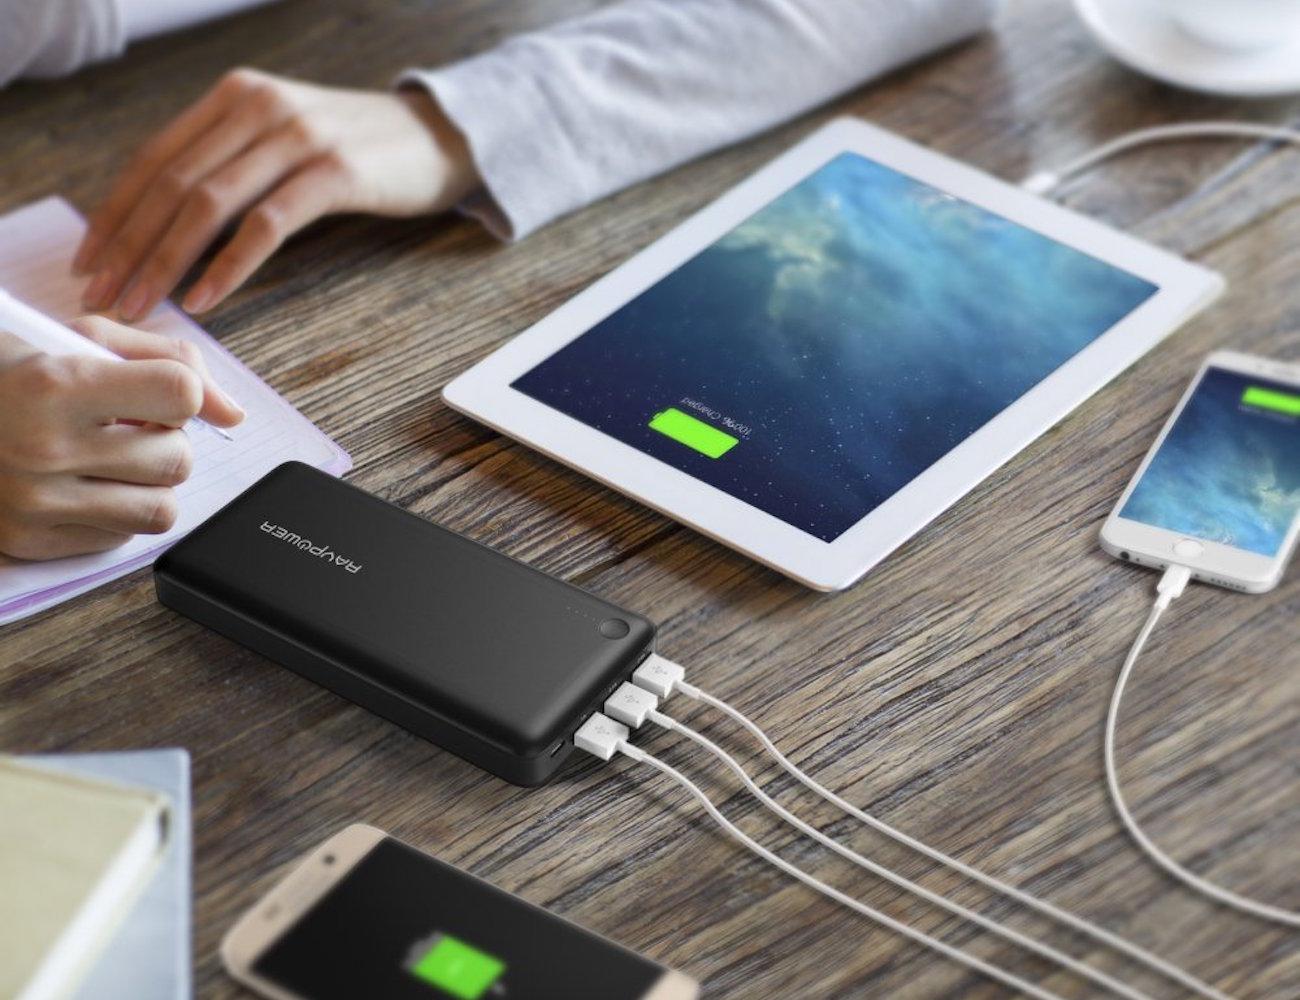 3-Port+External+Battery+Pack+By+RAVPower